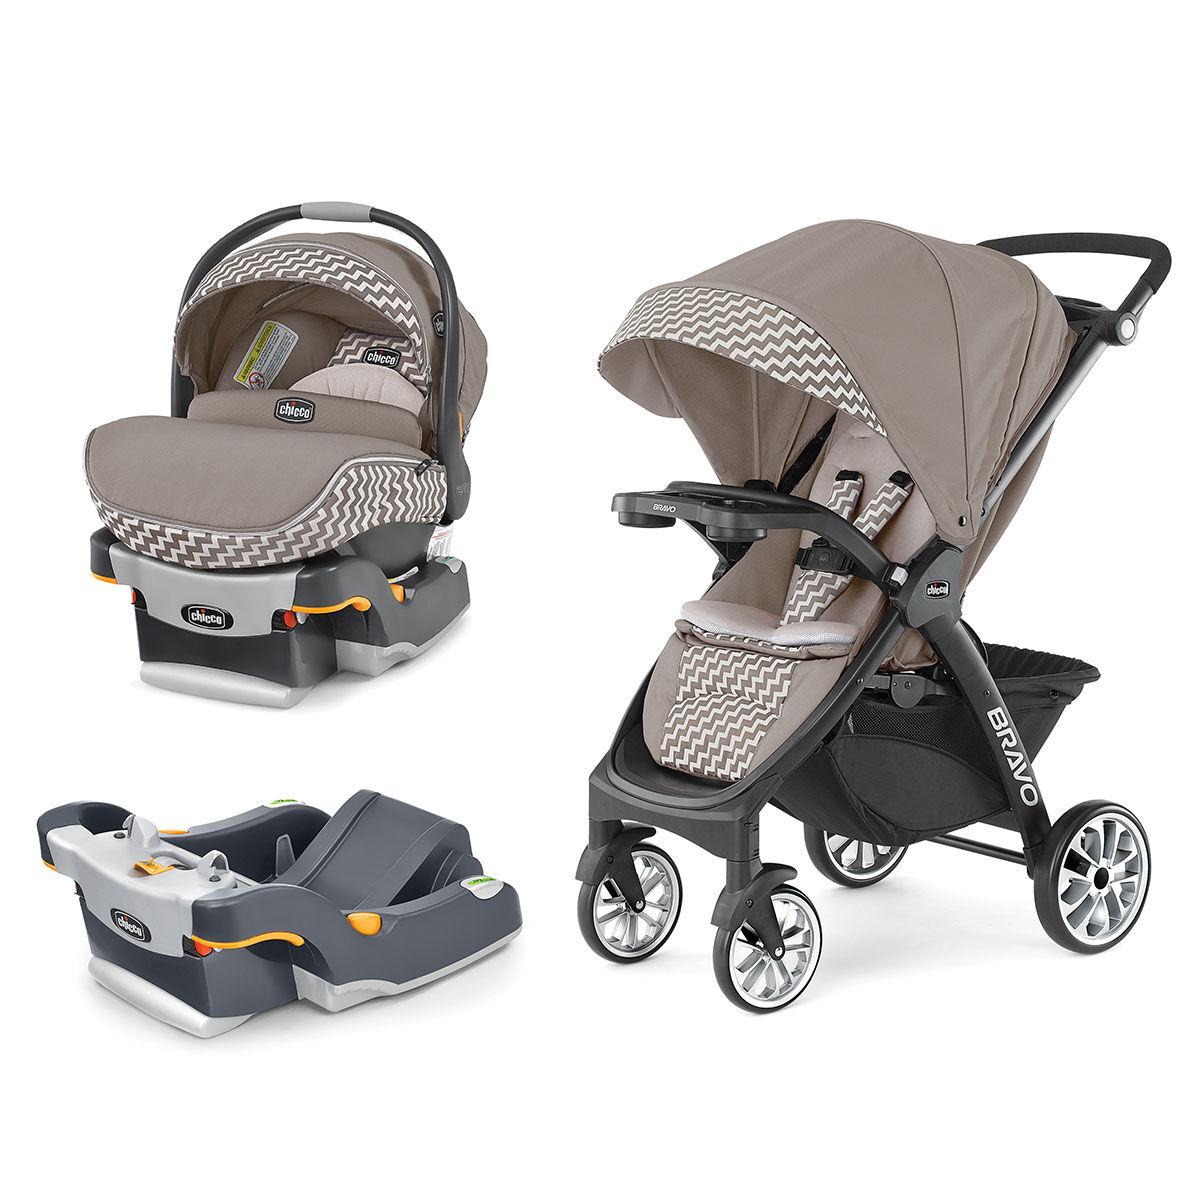 Singapore keyfit 30 zip infant car seat bravo le stroller bundle free additional basesingapore bravo le stroller car seat bundle